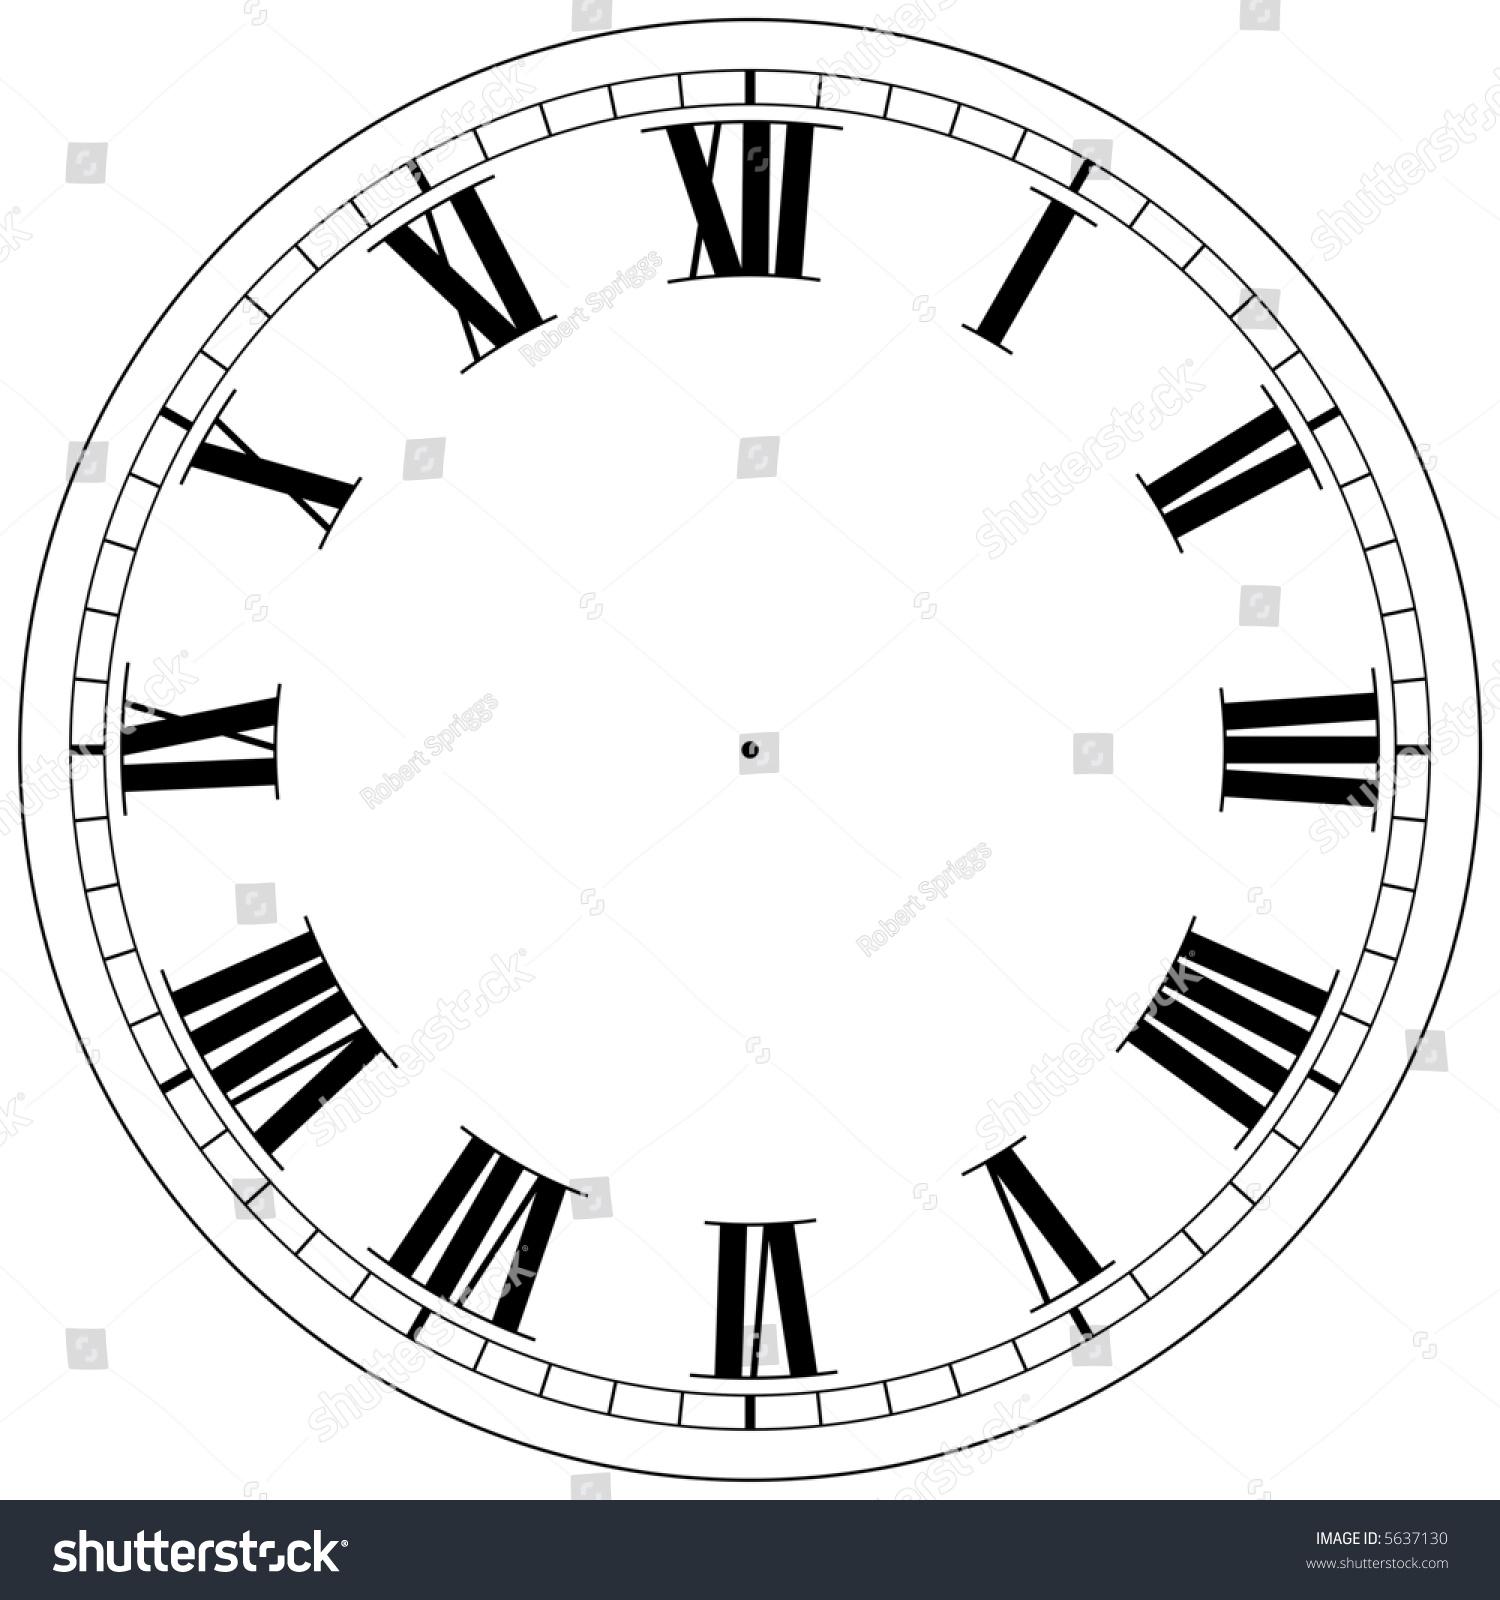 Precision Roman Clock Face Template Stock Photo 5637130 : Shutterstock